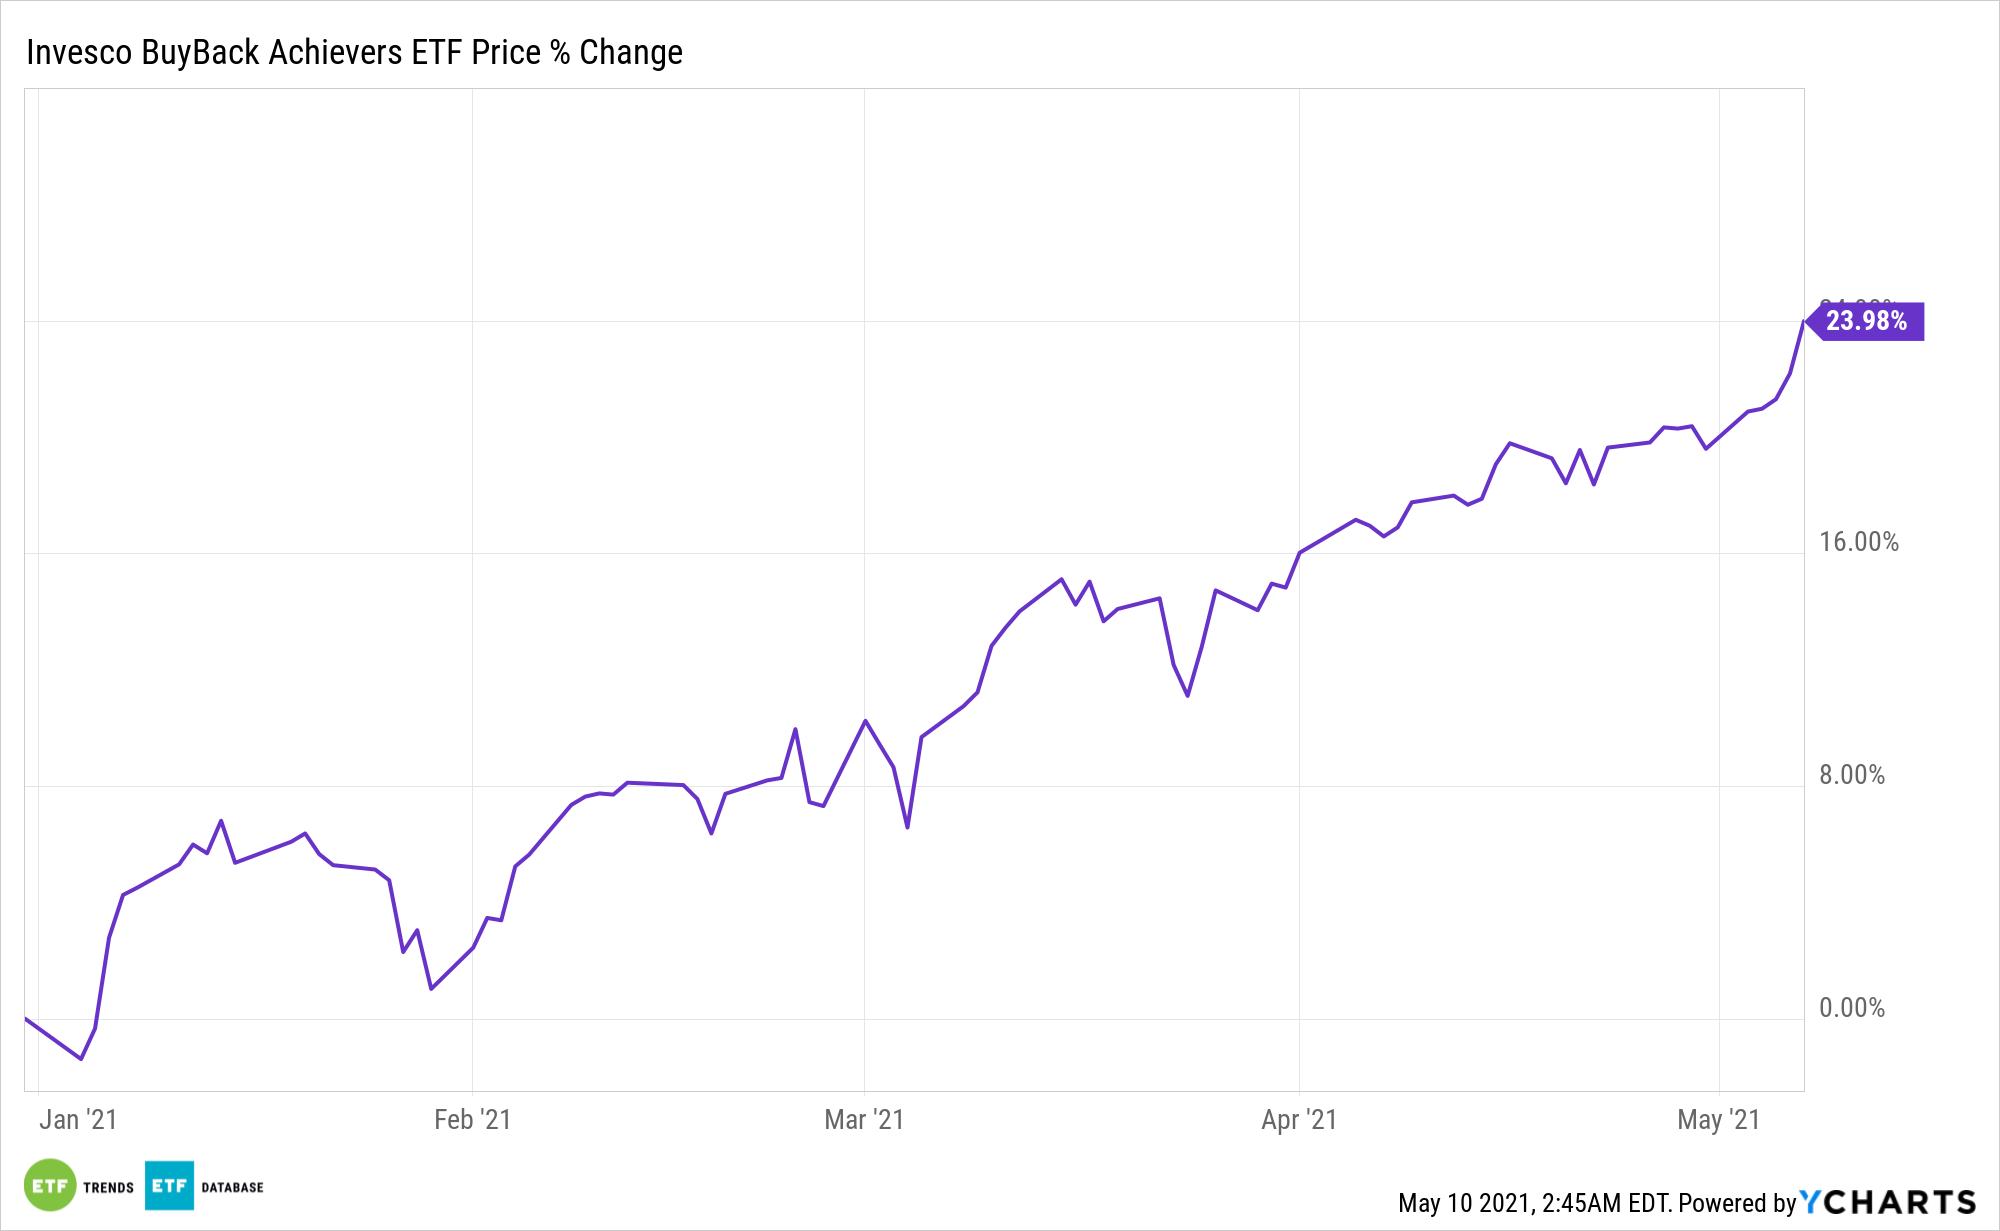 PKW Chart